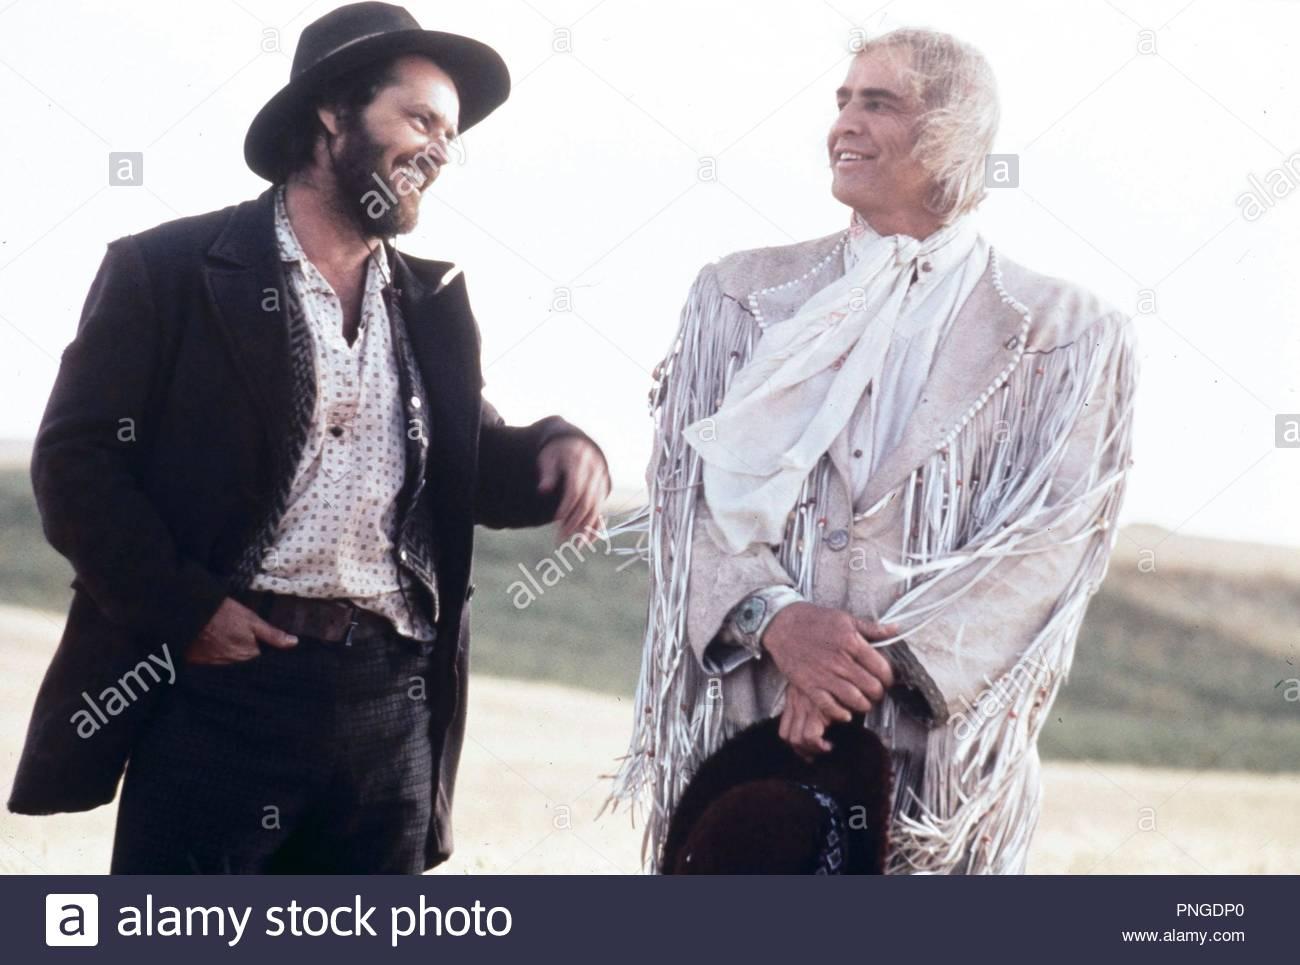 Original film title: THE MISSOURI BREAKS. English title: THE MISSOURI BREAKS. Year: 1976. Director: ARTHUR PENN. Stars: JACK NICHOLSON; MARLON BRANDO. Credit: UNITED ARTISTS / Album - Stock Image